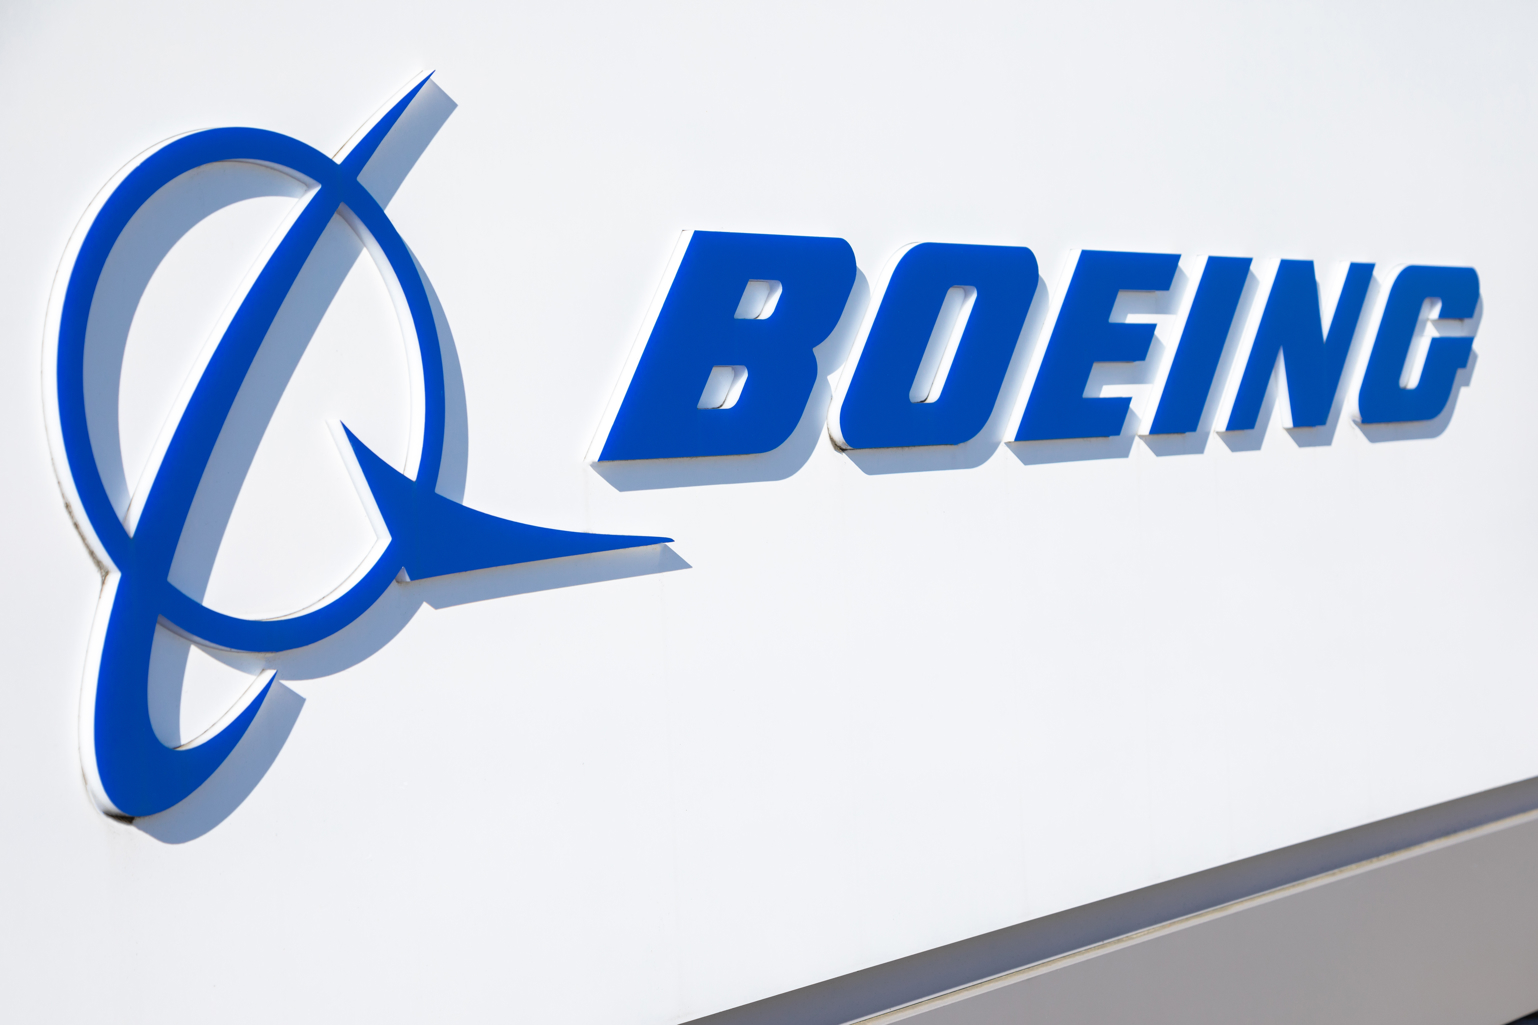 Boeing stock, BA stock, BA stock price, airplane stocks